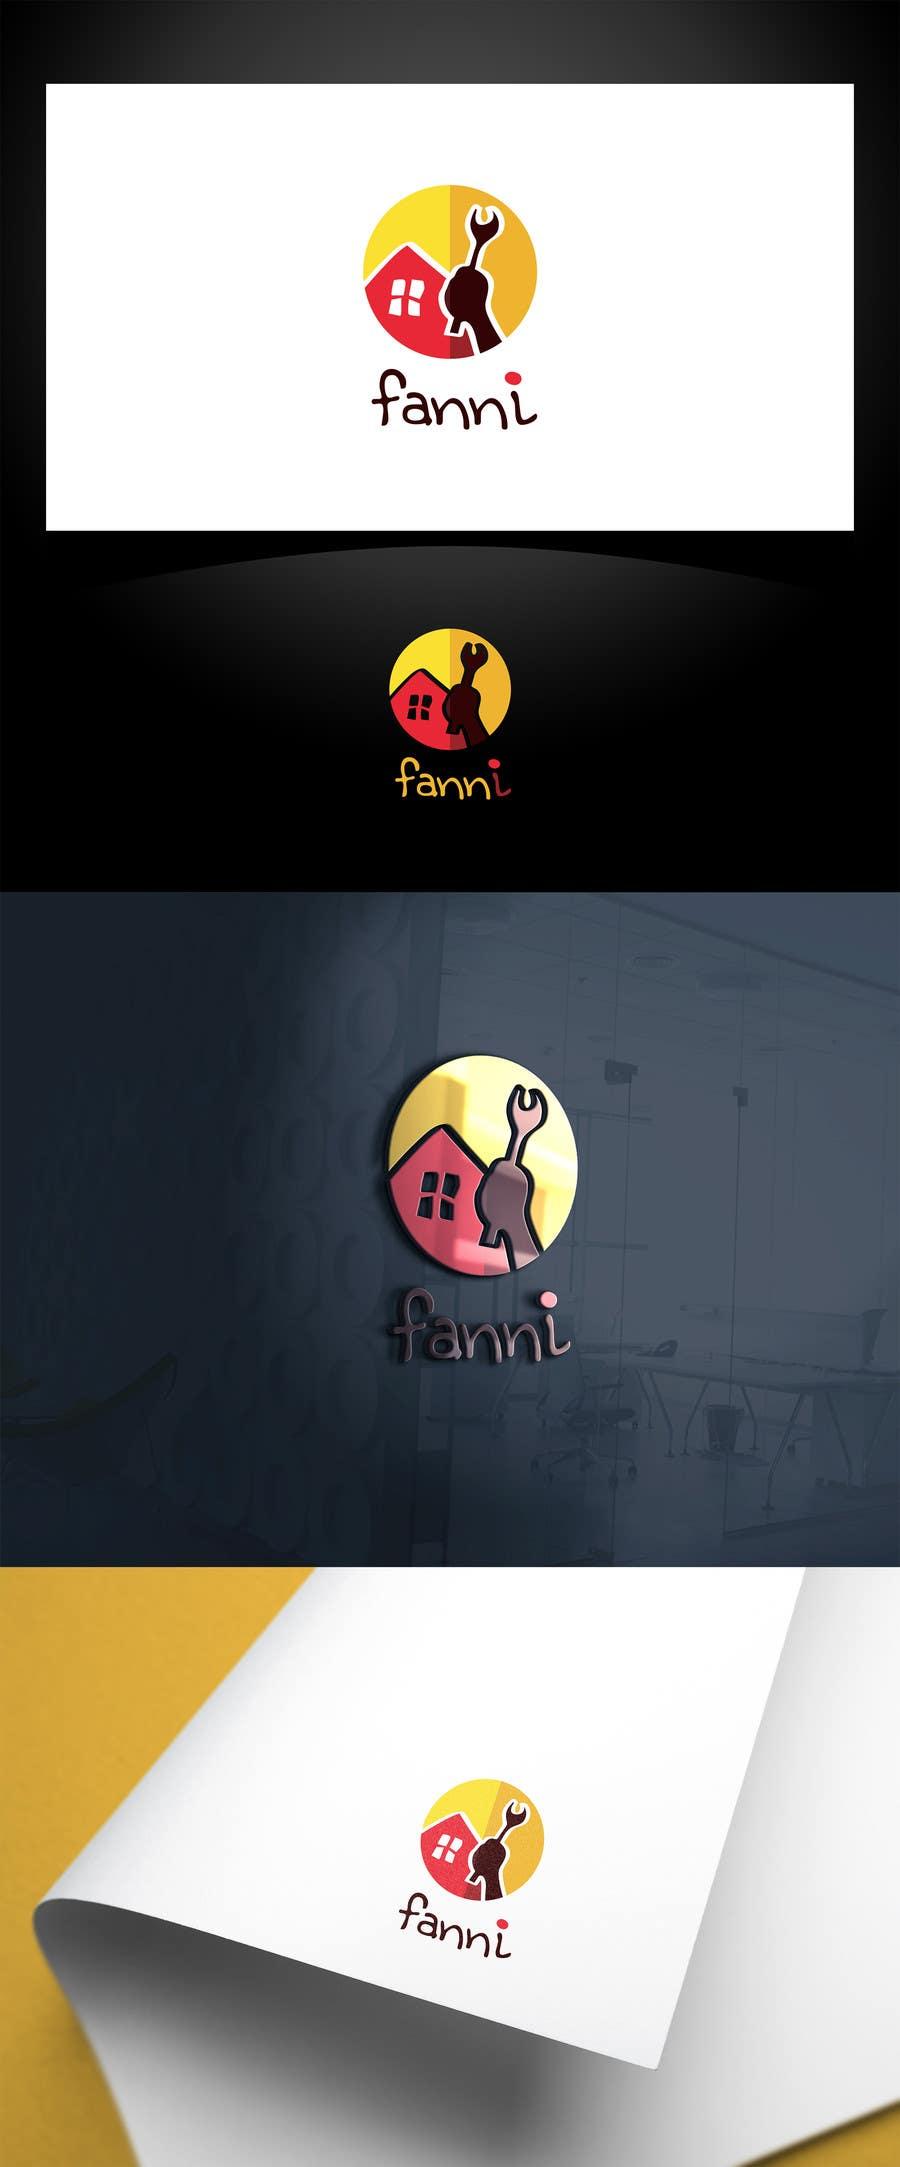 Příspěvek č. 40 do soutěže Design 2 Logos and reDraw one pic.  Arabic and English